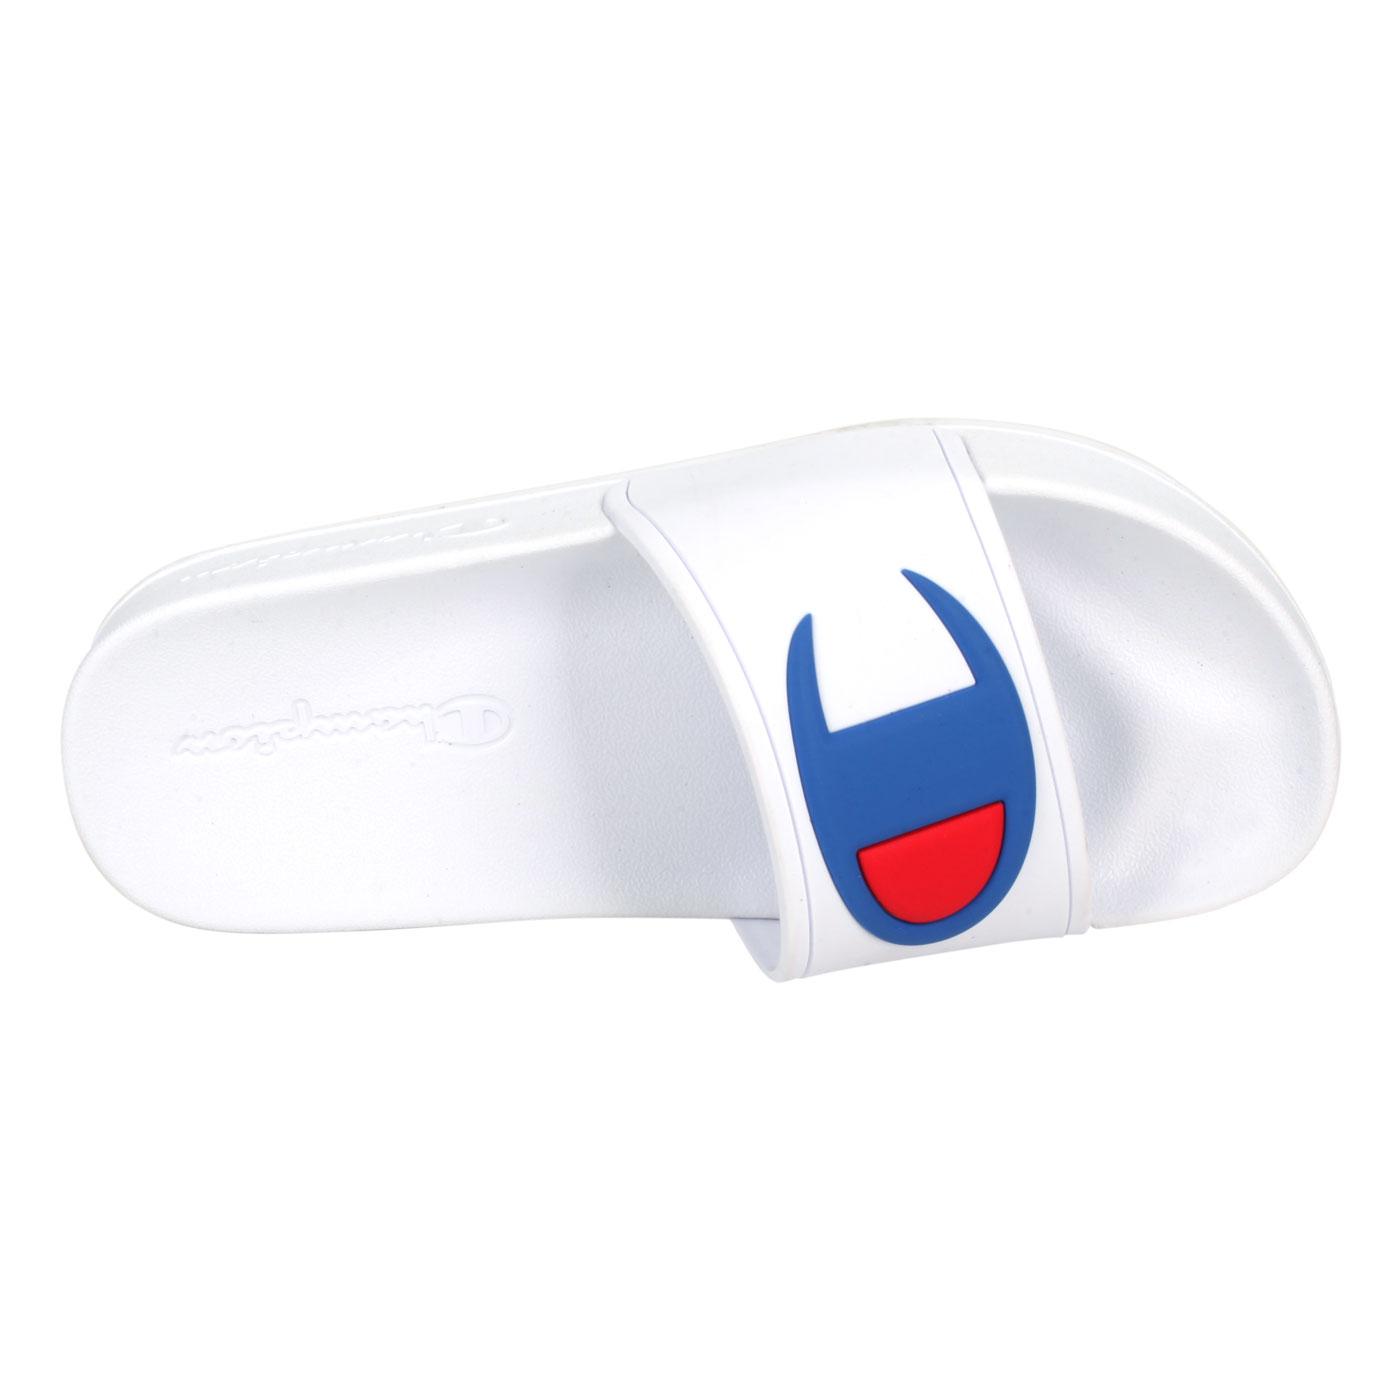 Champion 運動拖鞋 CUSLS-1019-00 - 白藍紅